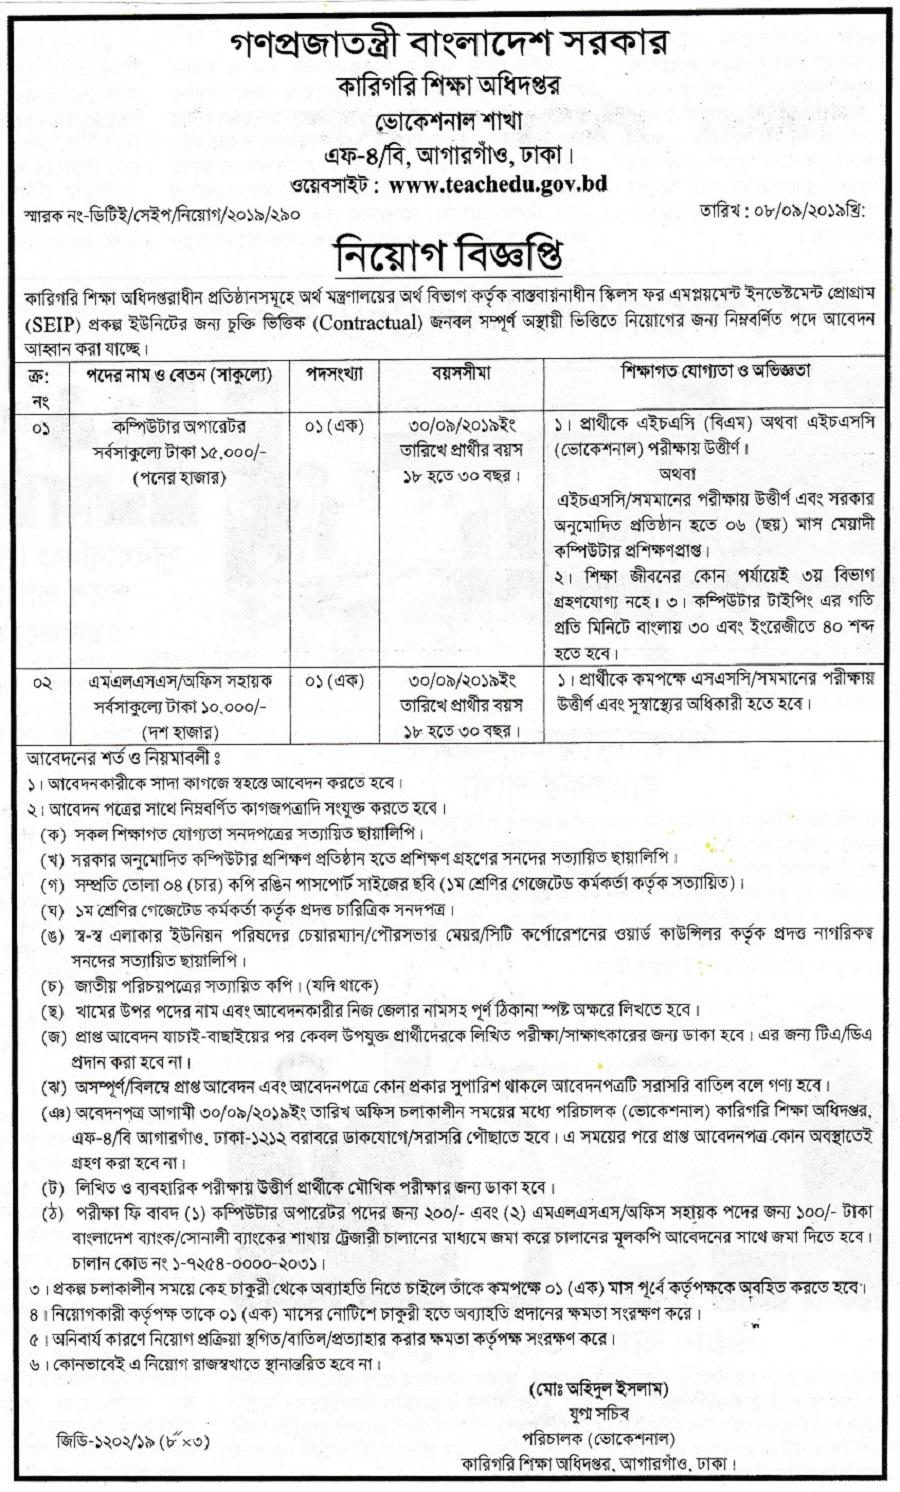 Bangladesh Technical Education Board (BTEB) Job Circular